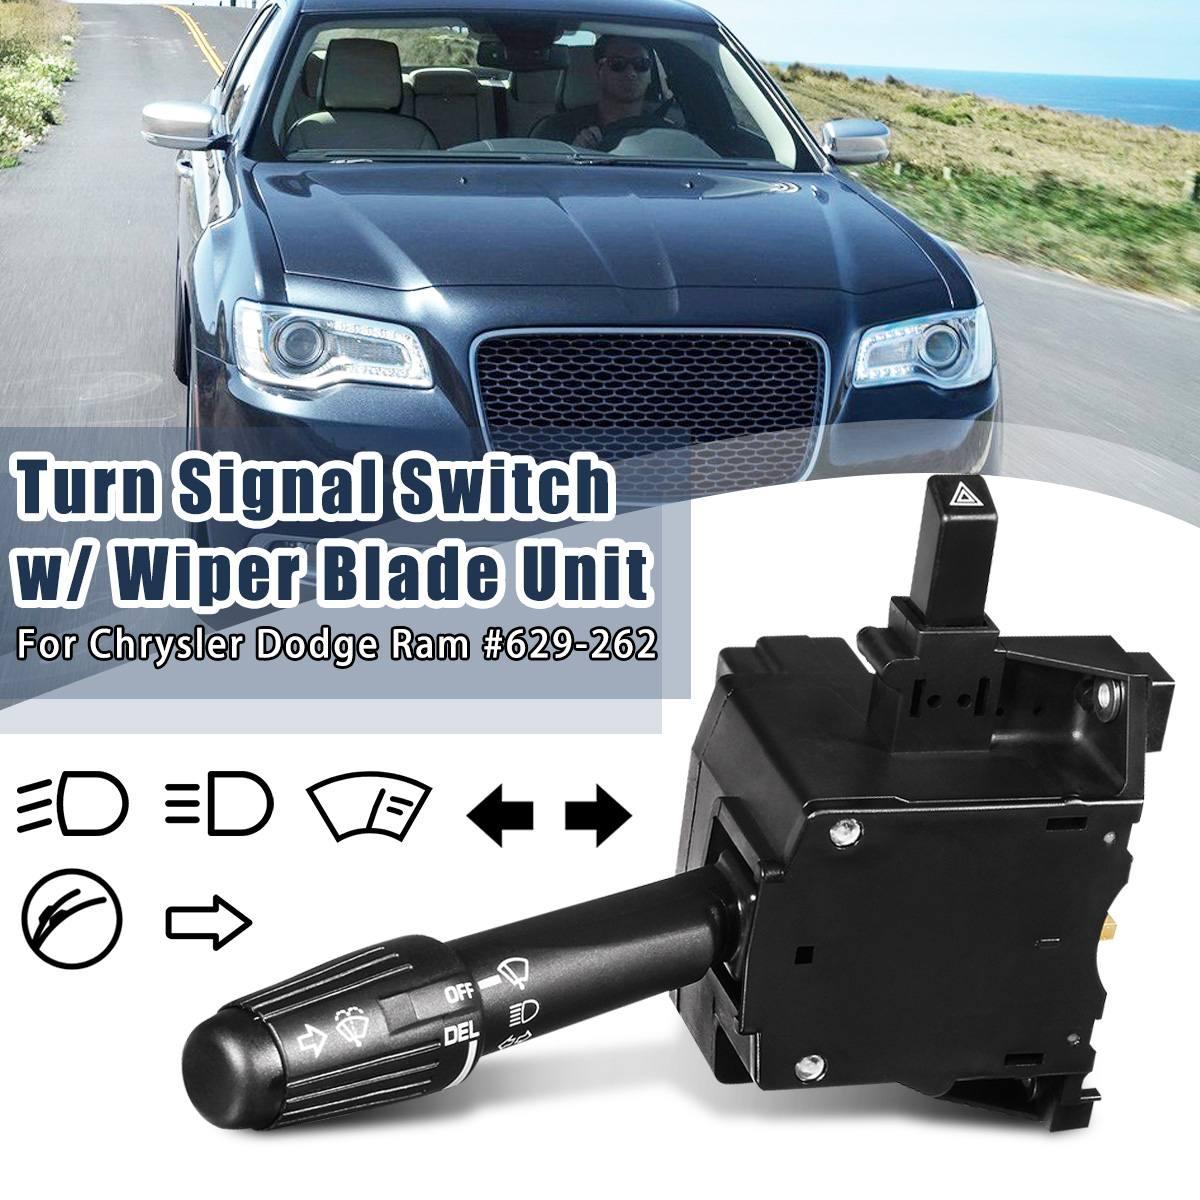 #629-262 Faro de coche + Luz de señal de giro + Unidad de interruptor de escobilla de limpiaparabrisas para Jeep Cherokee/Chrysler/Plymouth/Dodge Ram 1500 2500 B250